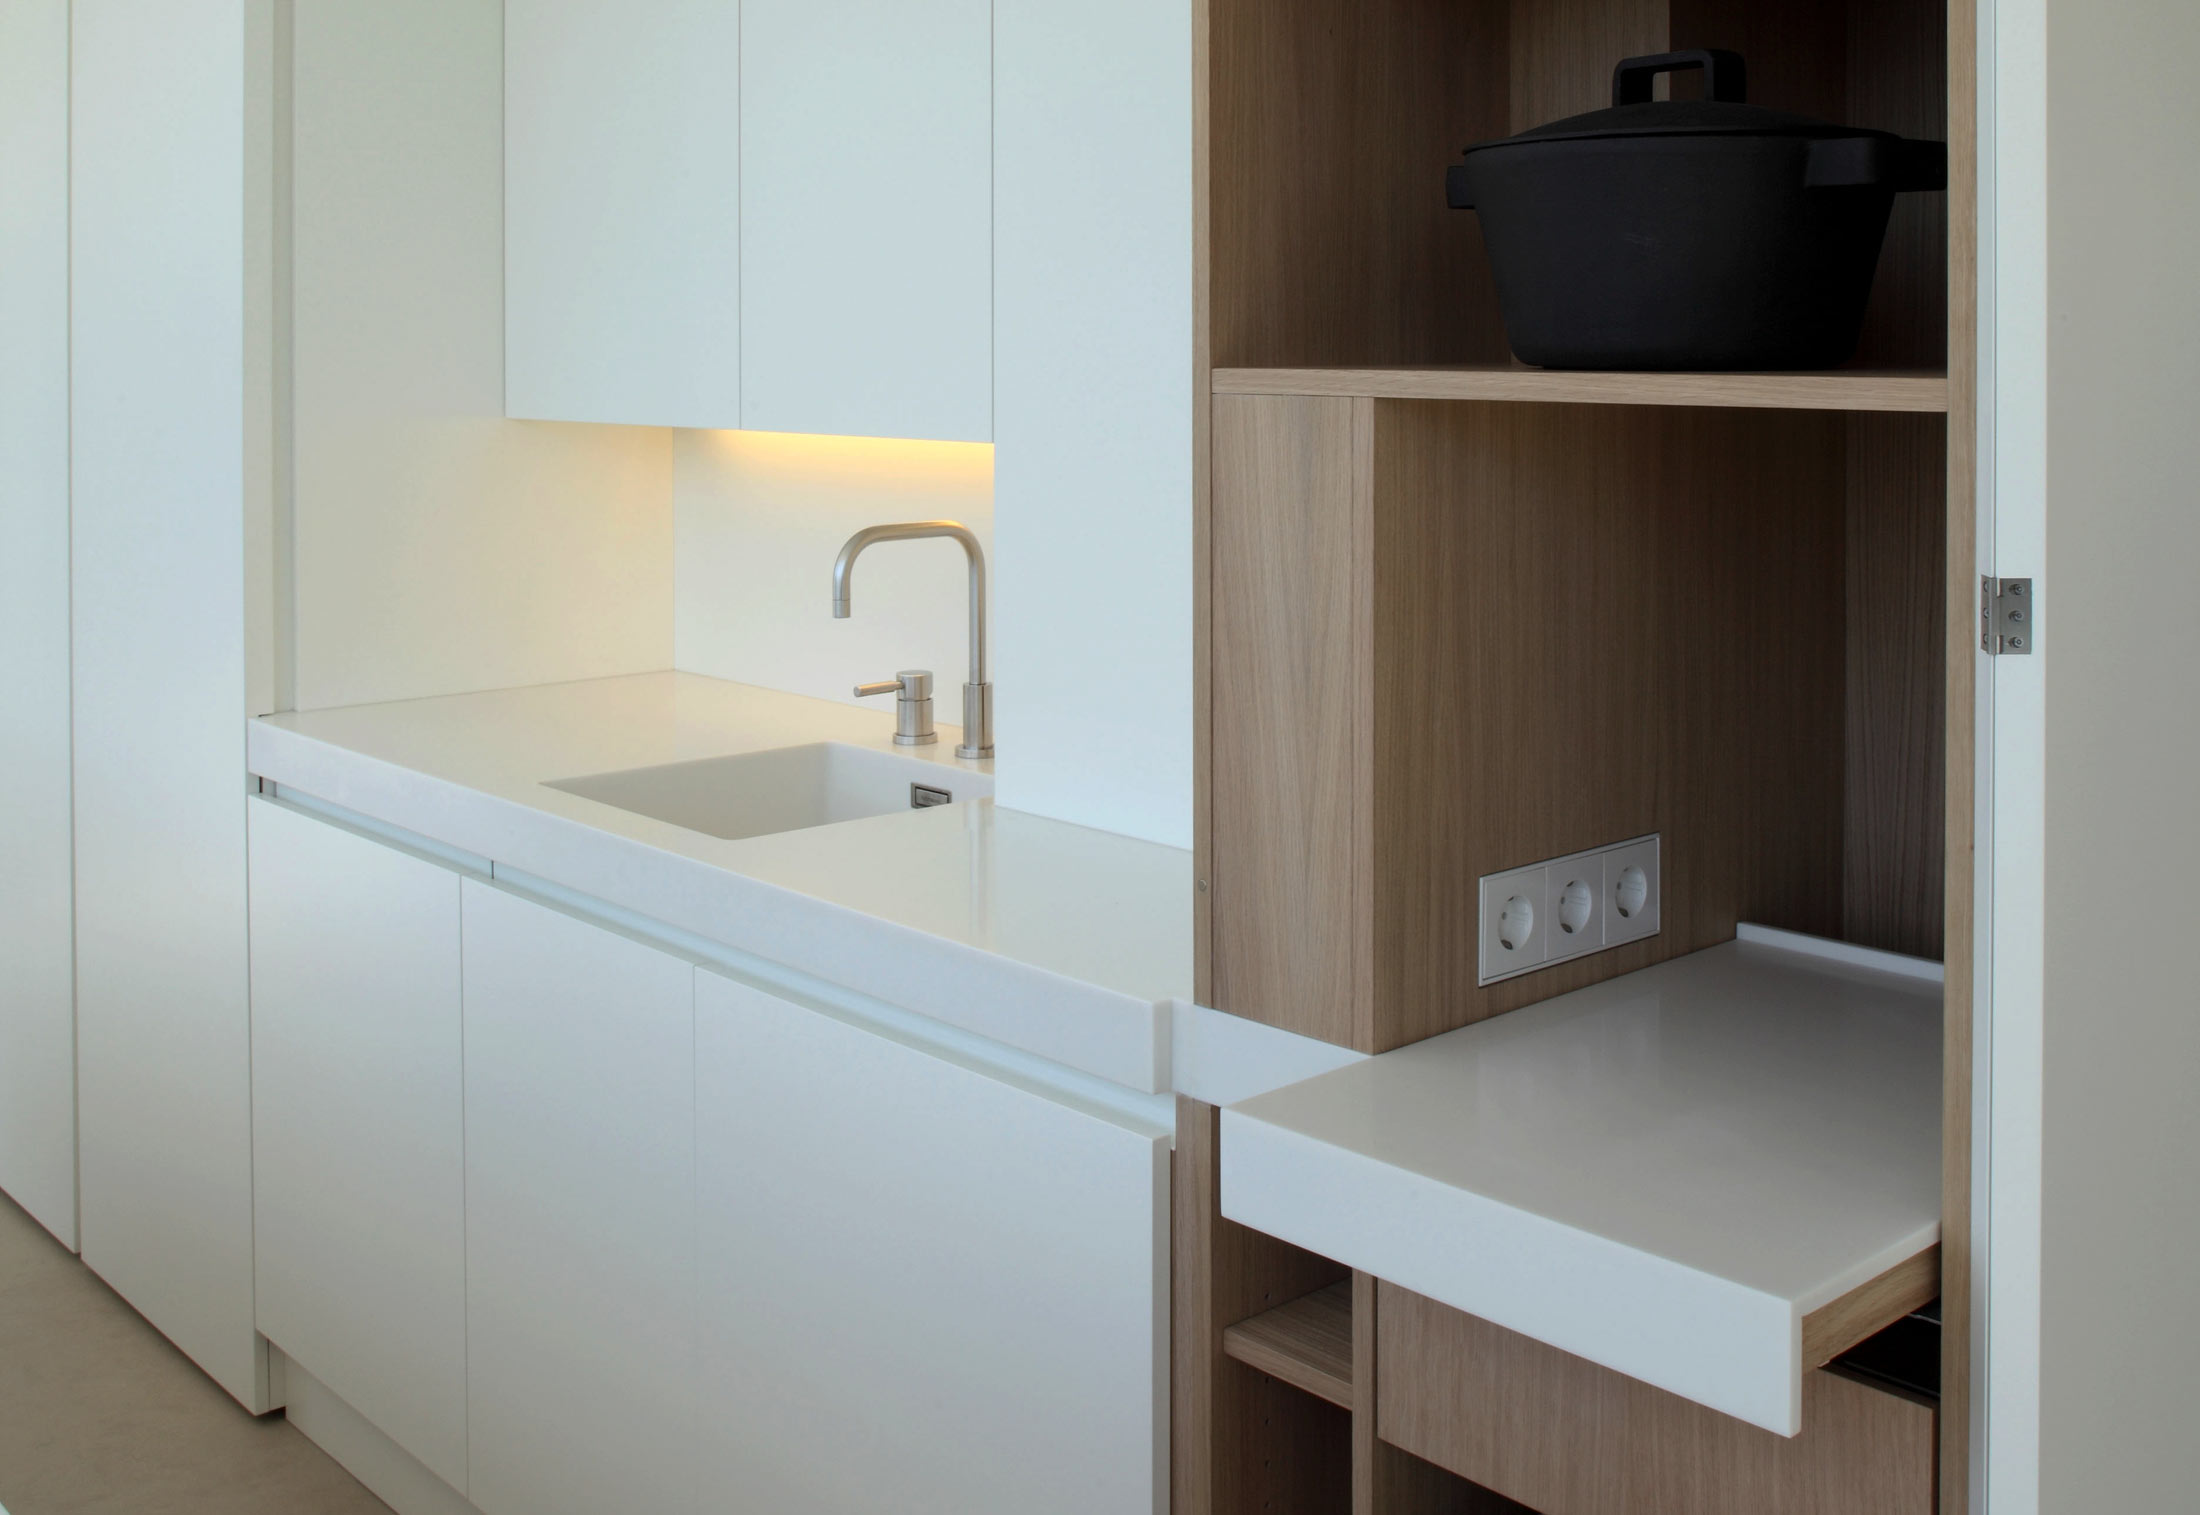 Kitchen O17 by Holzrausch | STYLEPARK